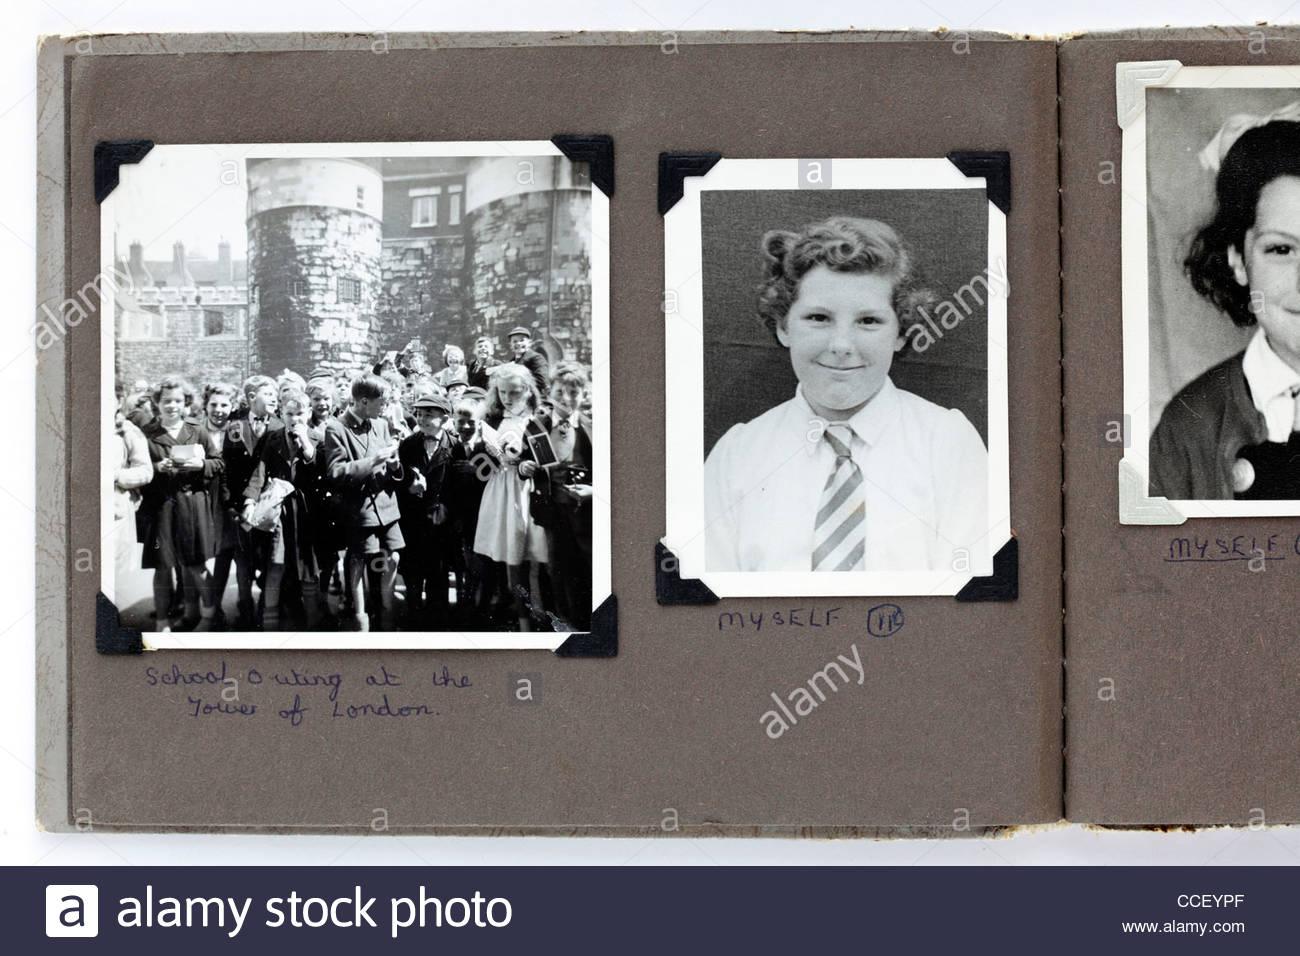 Viaje escolar a la Torre de Londres 1950 Imagen De Stock